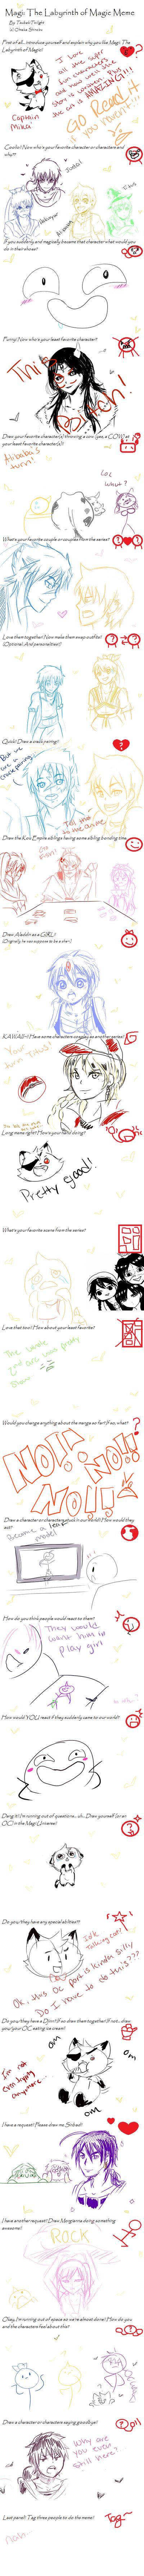 Magi Meme by CaptainMika